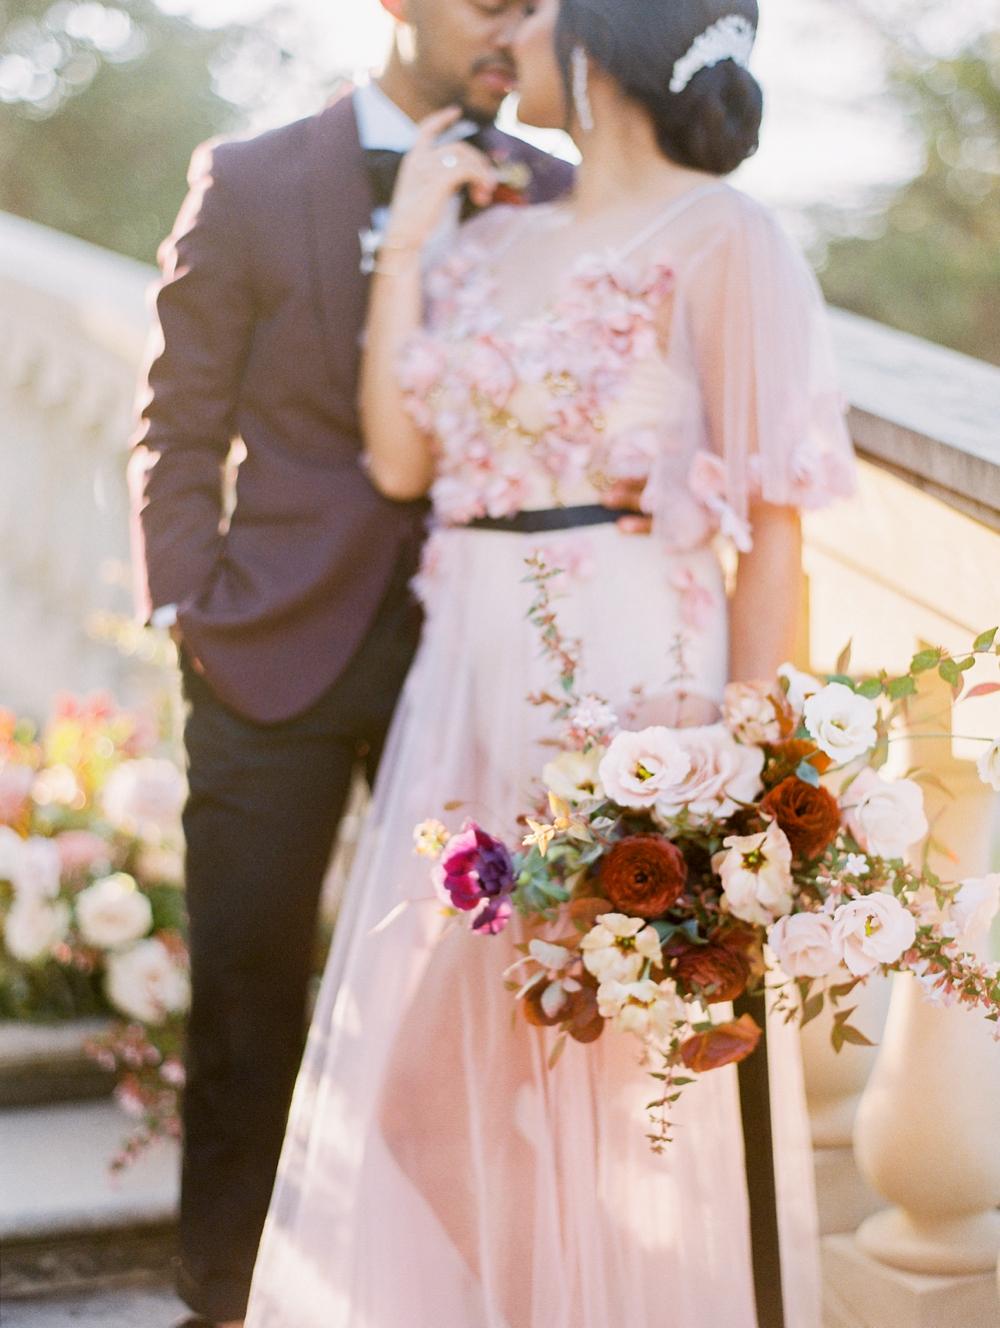 kristin-la-voie-photography-TEXAS-Wedding-Photographer-THE-OLANA-DALLAS-FINE-ART-62